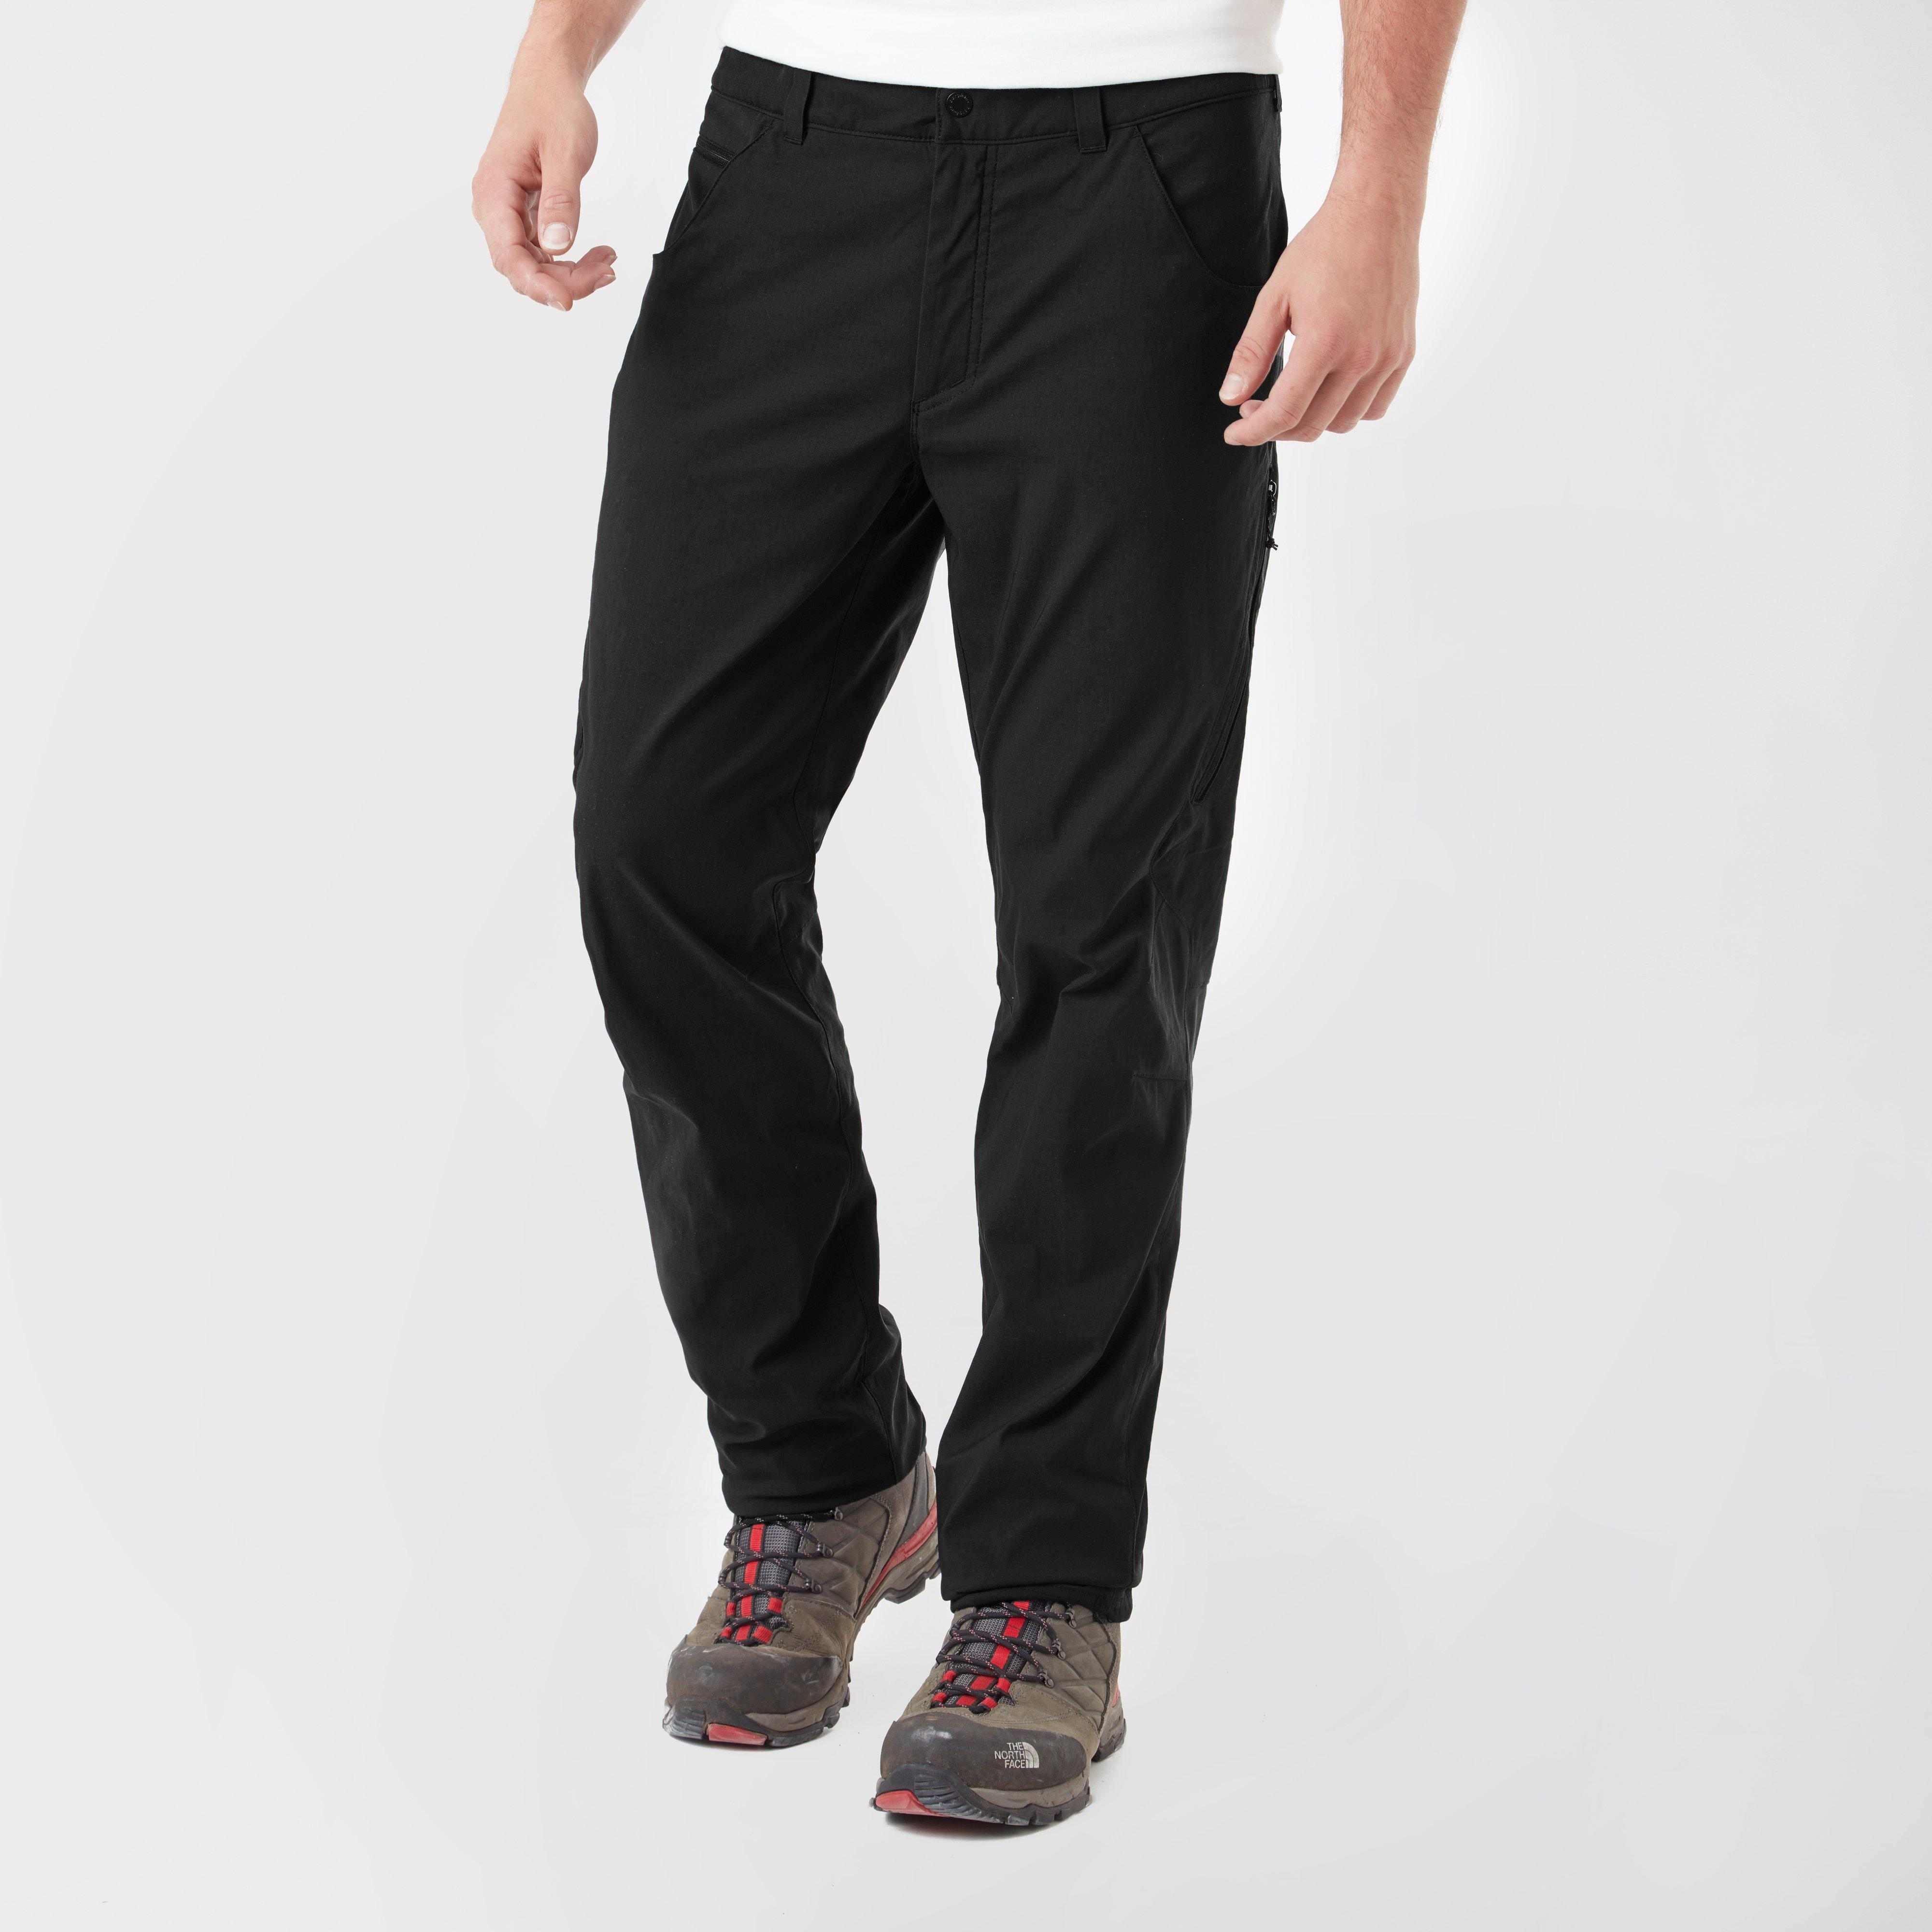 Berghaus Ortler 2.0 - Black/pant  Black/pant